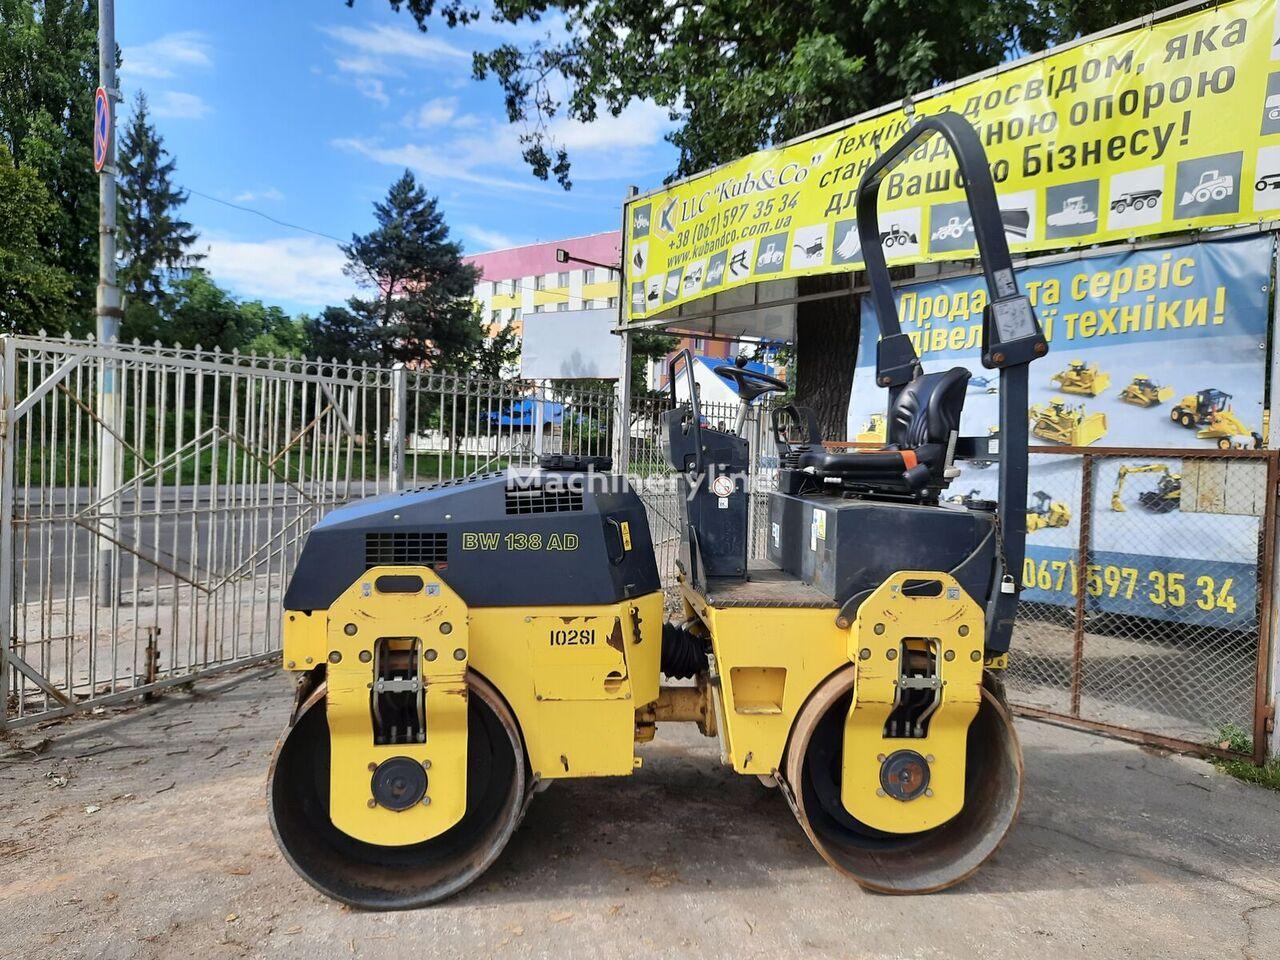 BOMAG BW138AD mini road roller